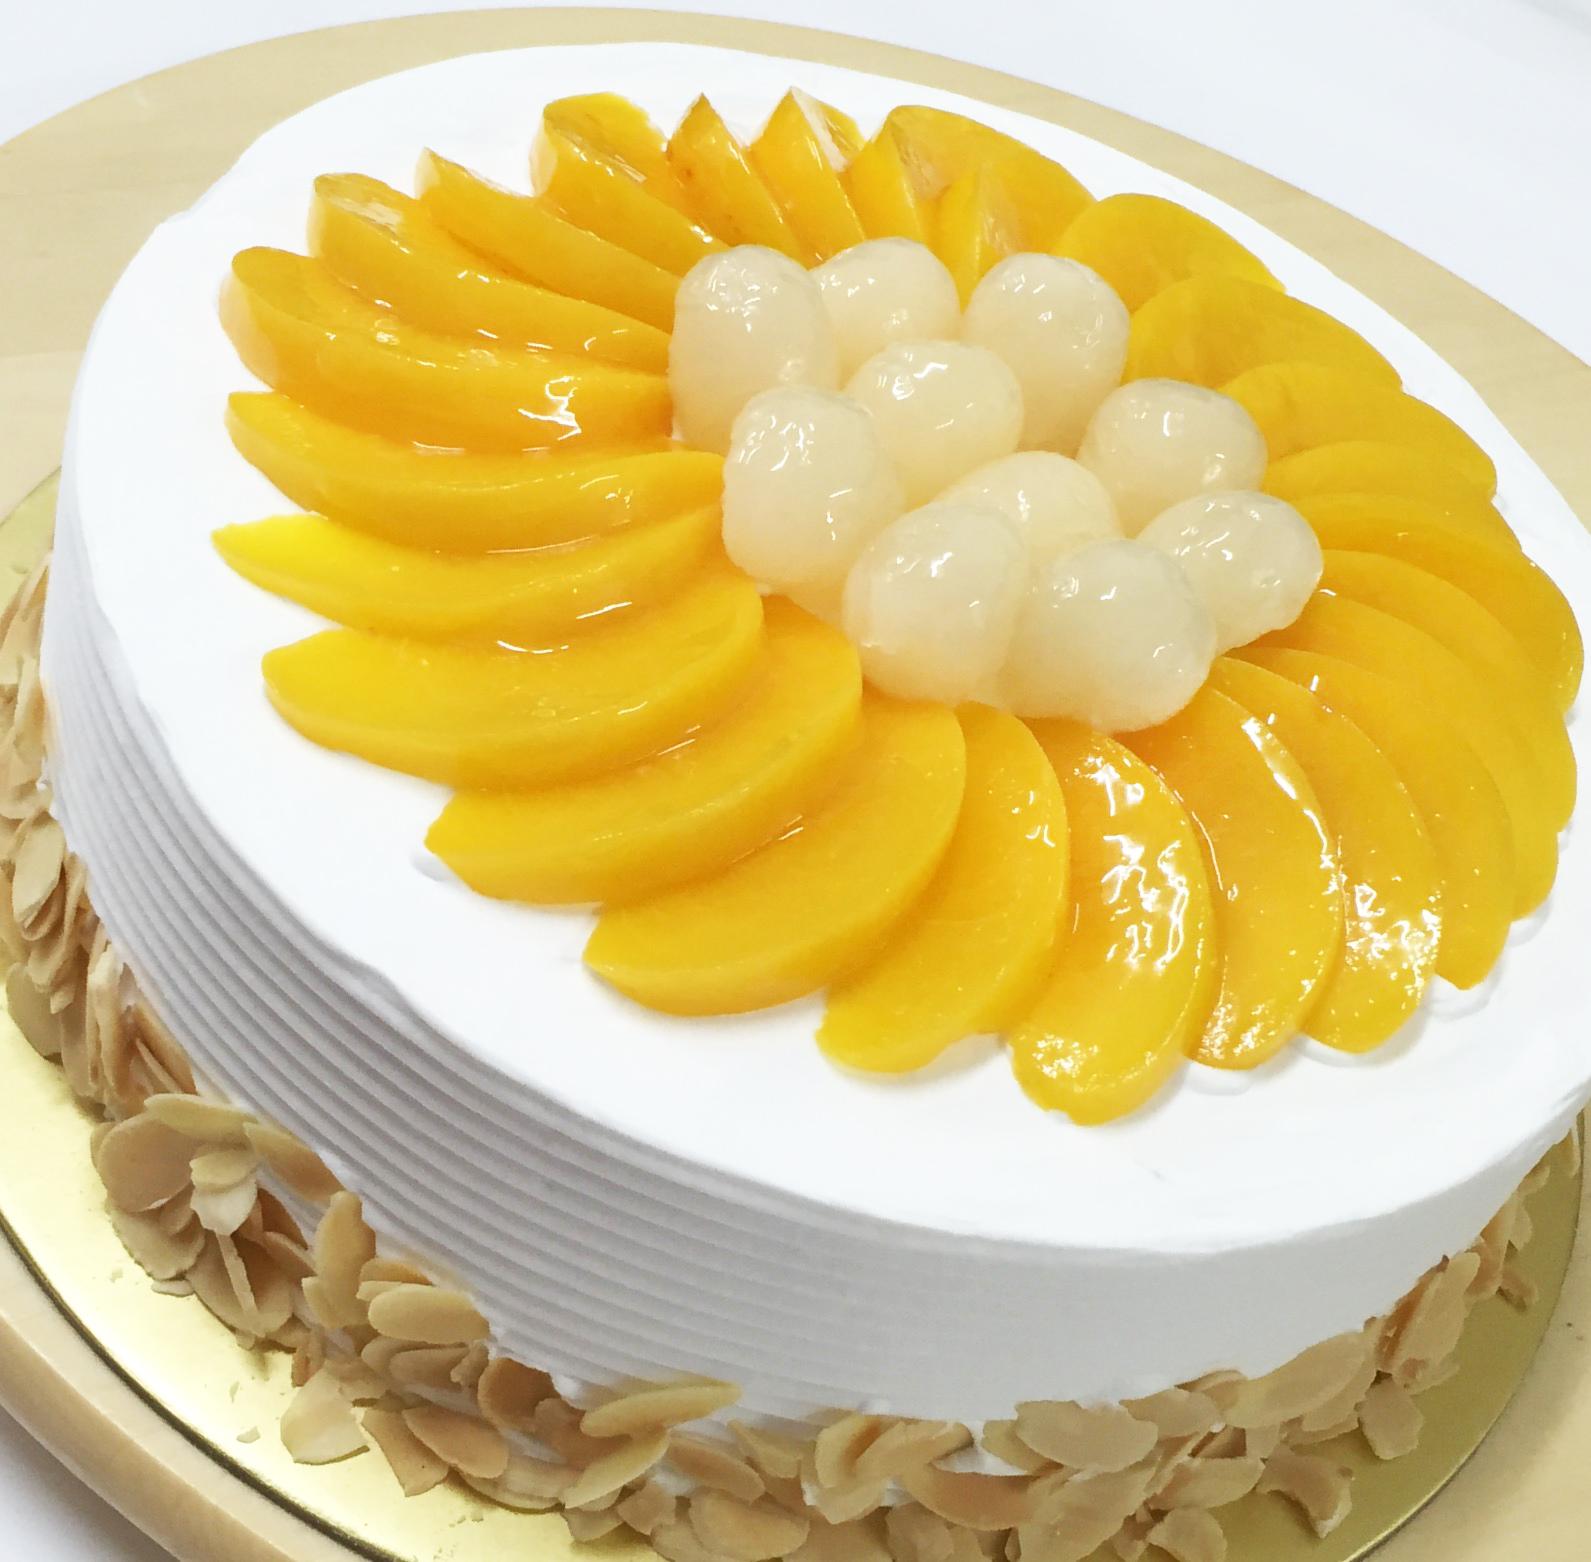 Longan & Peach Cake